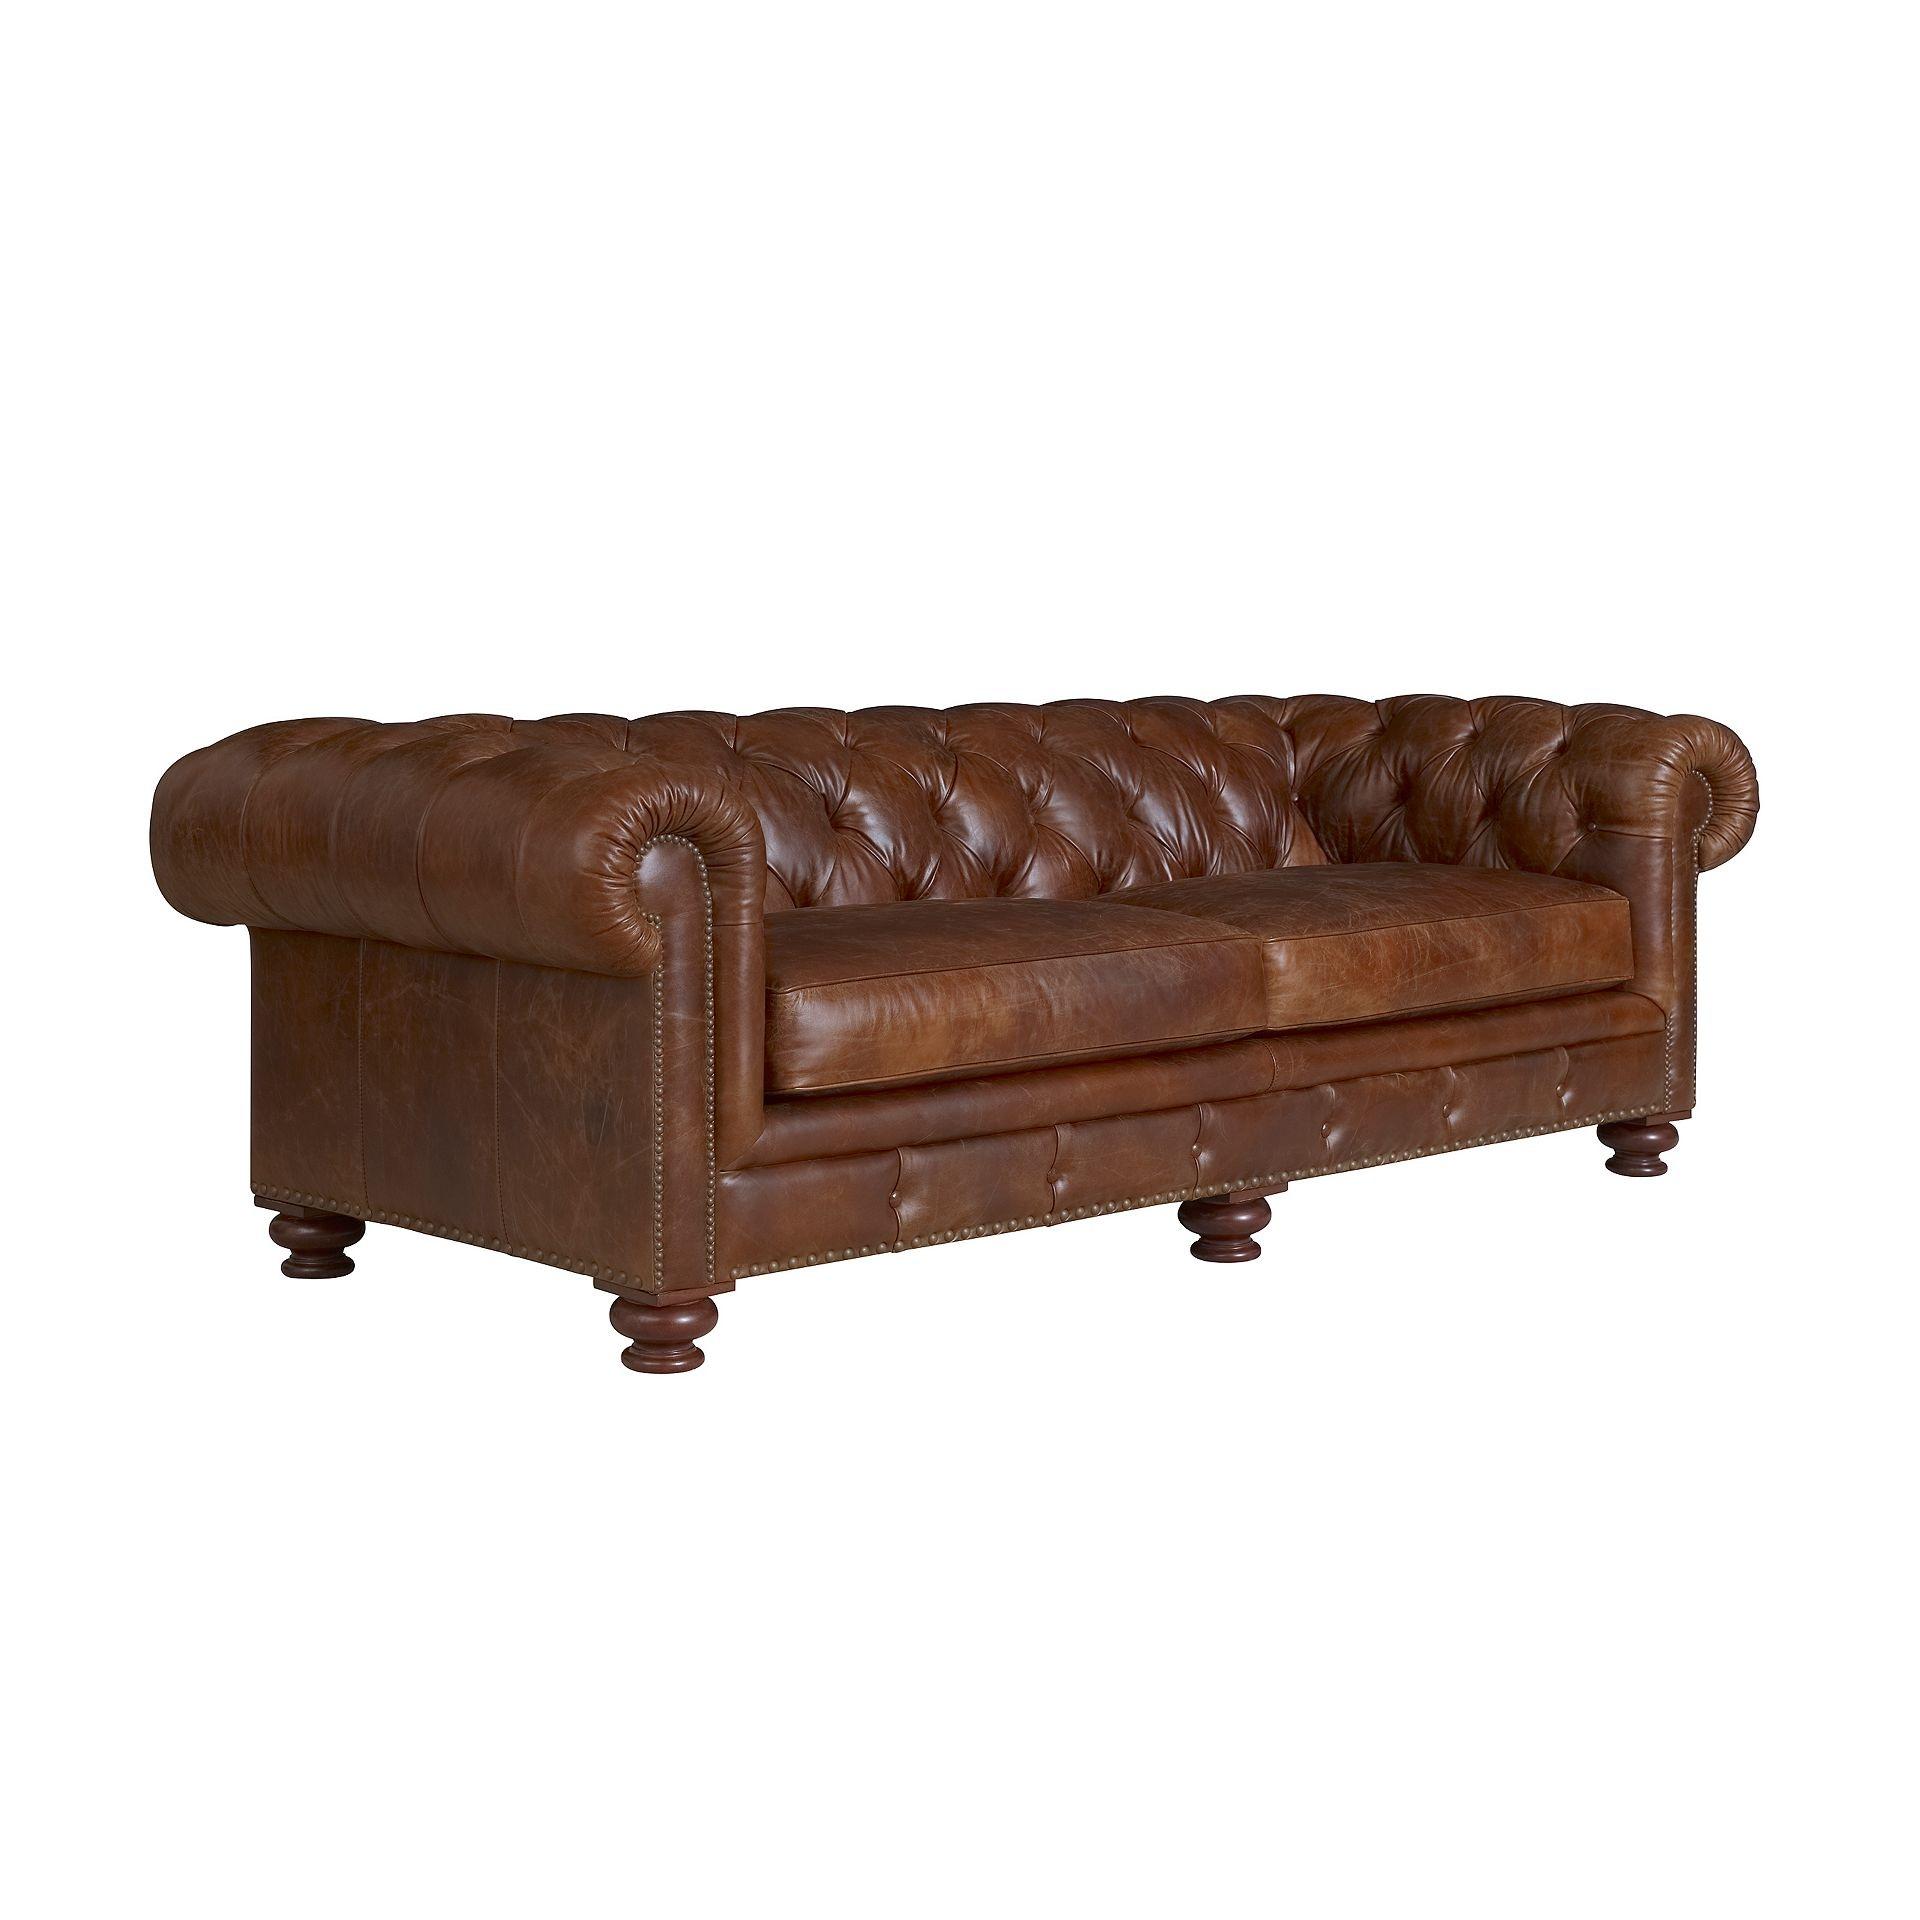 Henredon Furniture Henredon Leather Company Diamond Short Sofa IL8843 B